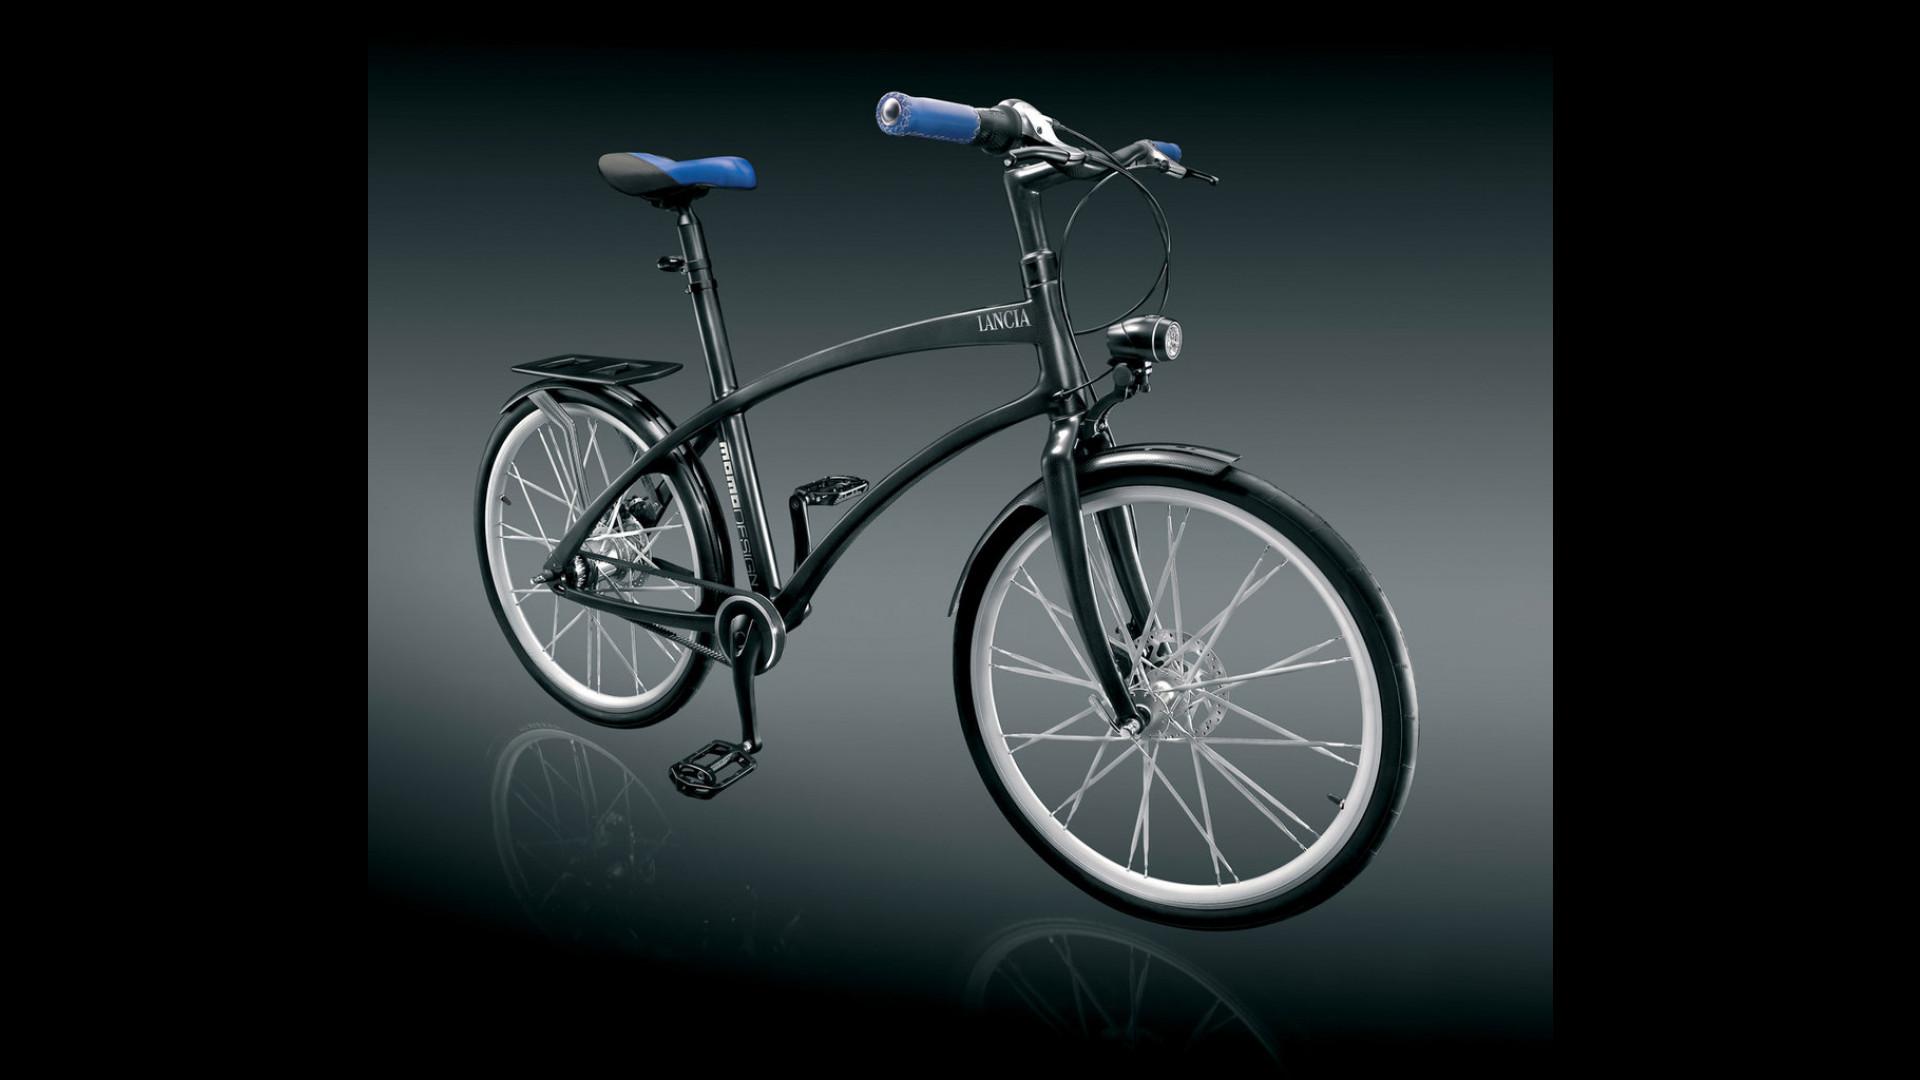 Lancia E Momodesign Presentano La Urban Bike